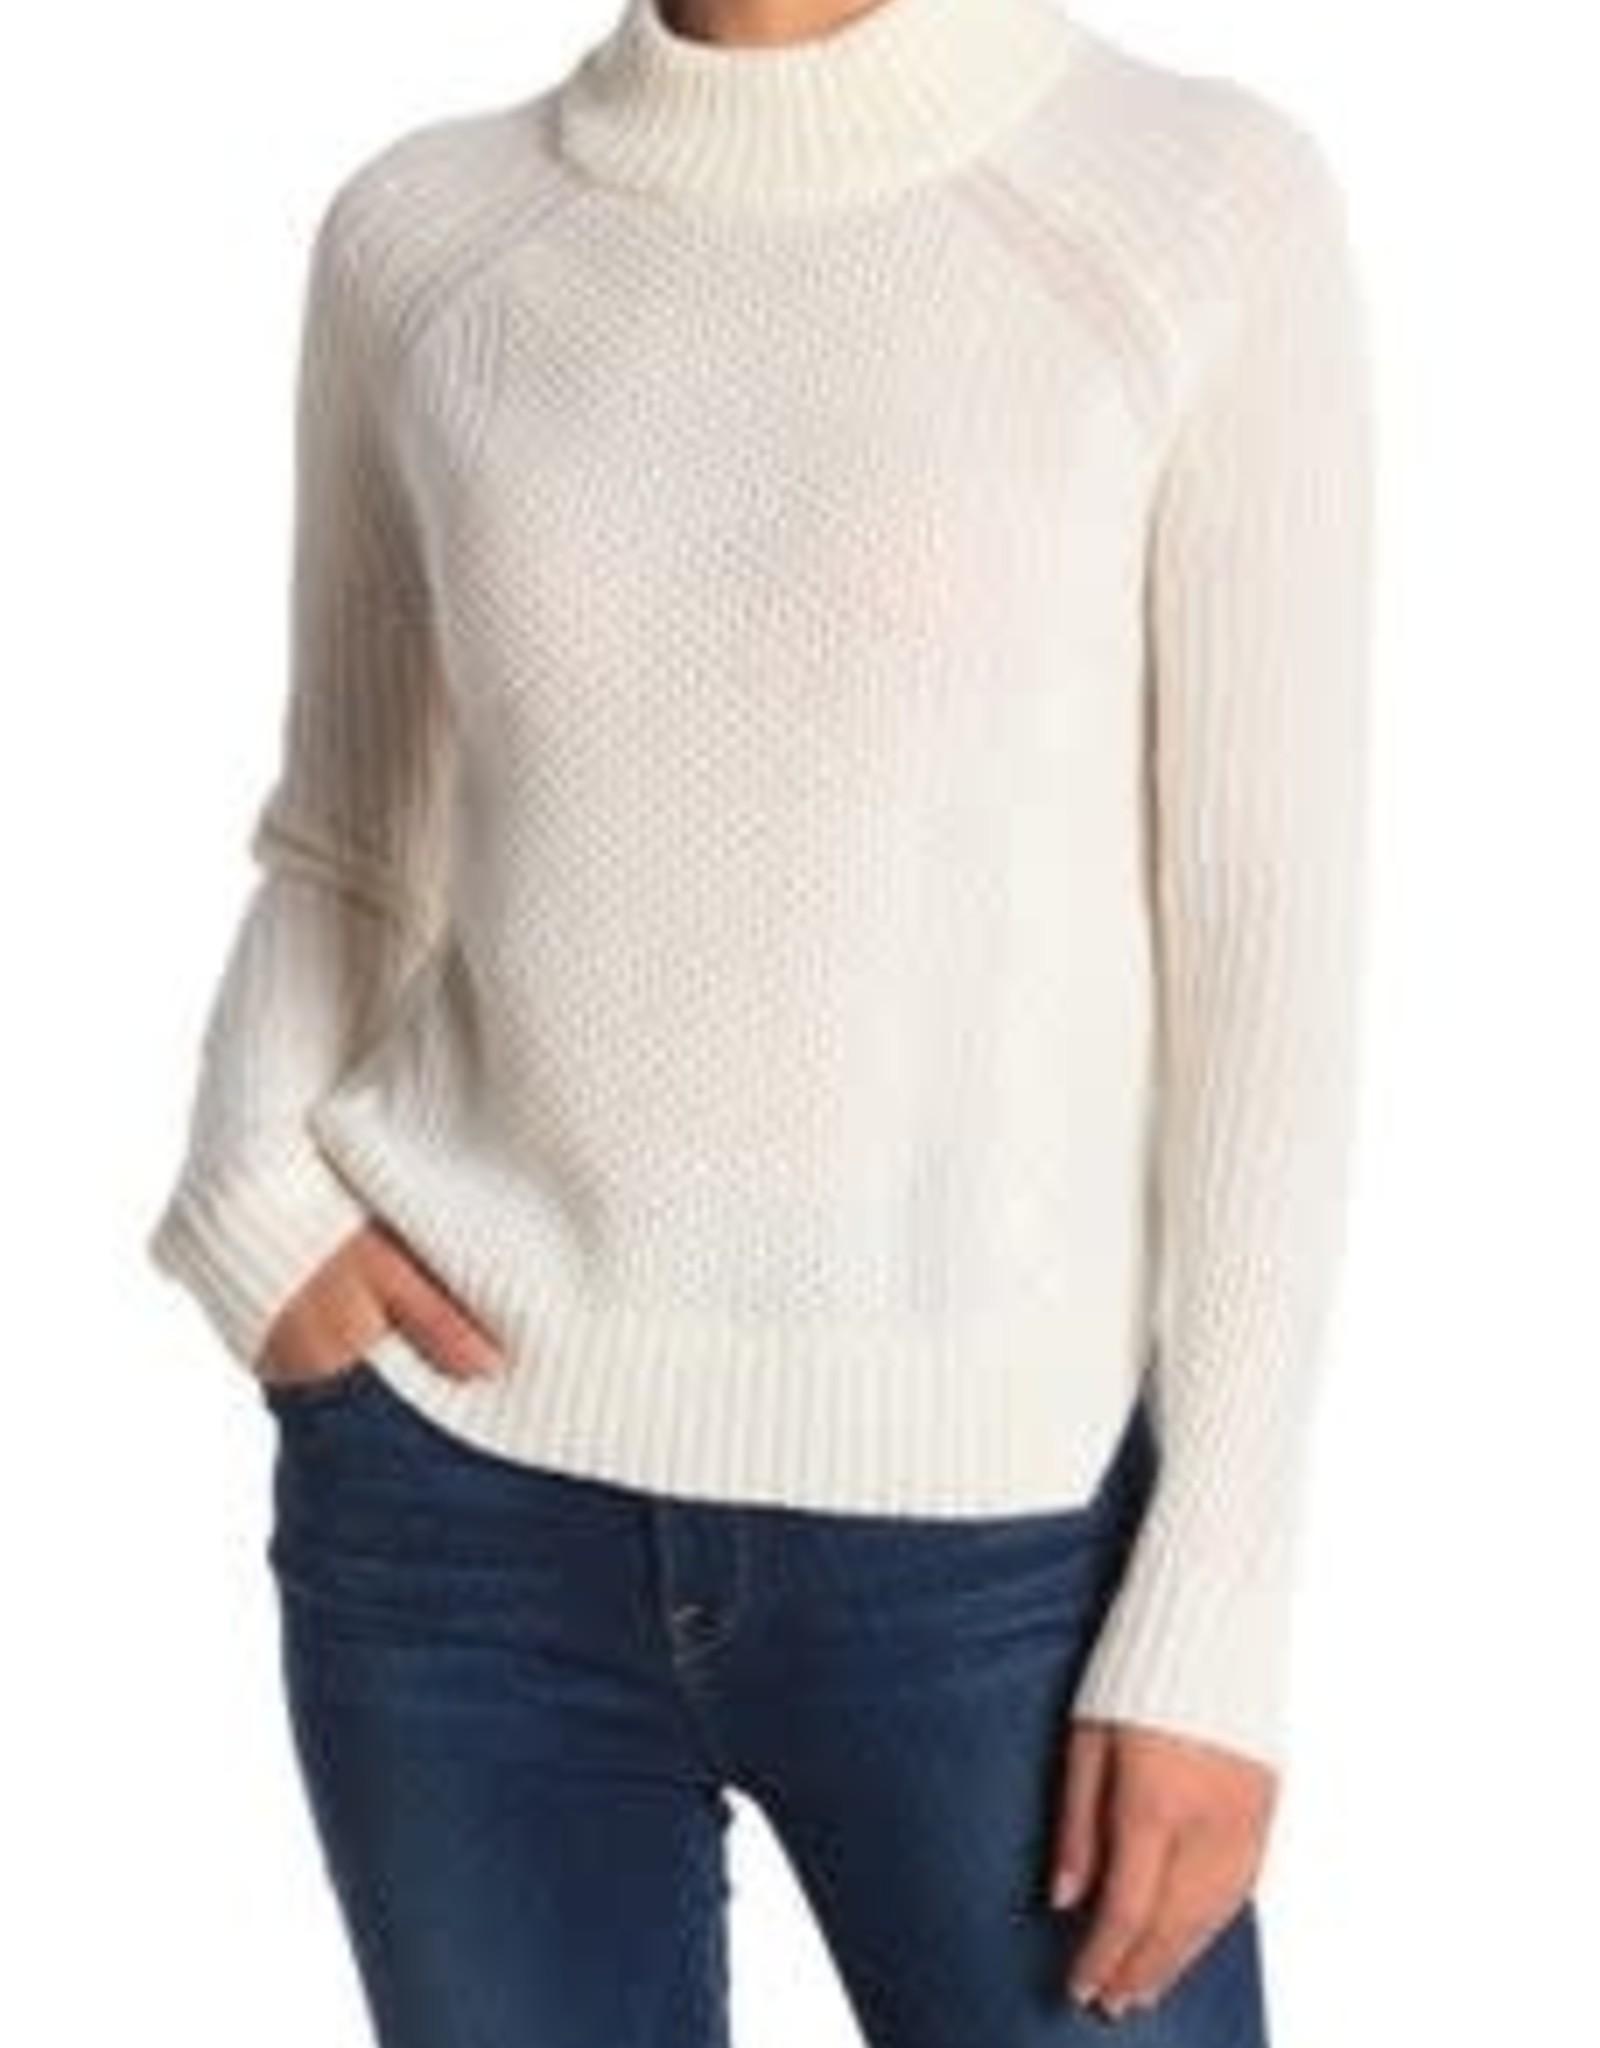 Griffen Cashmere Griffin Cashmere Ivory Knit Sweater Sz M